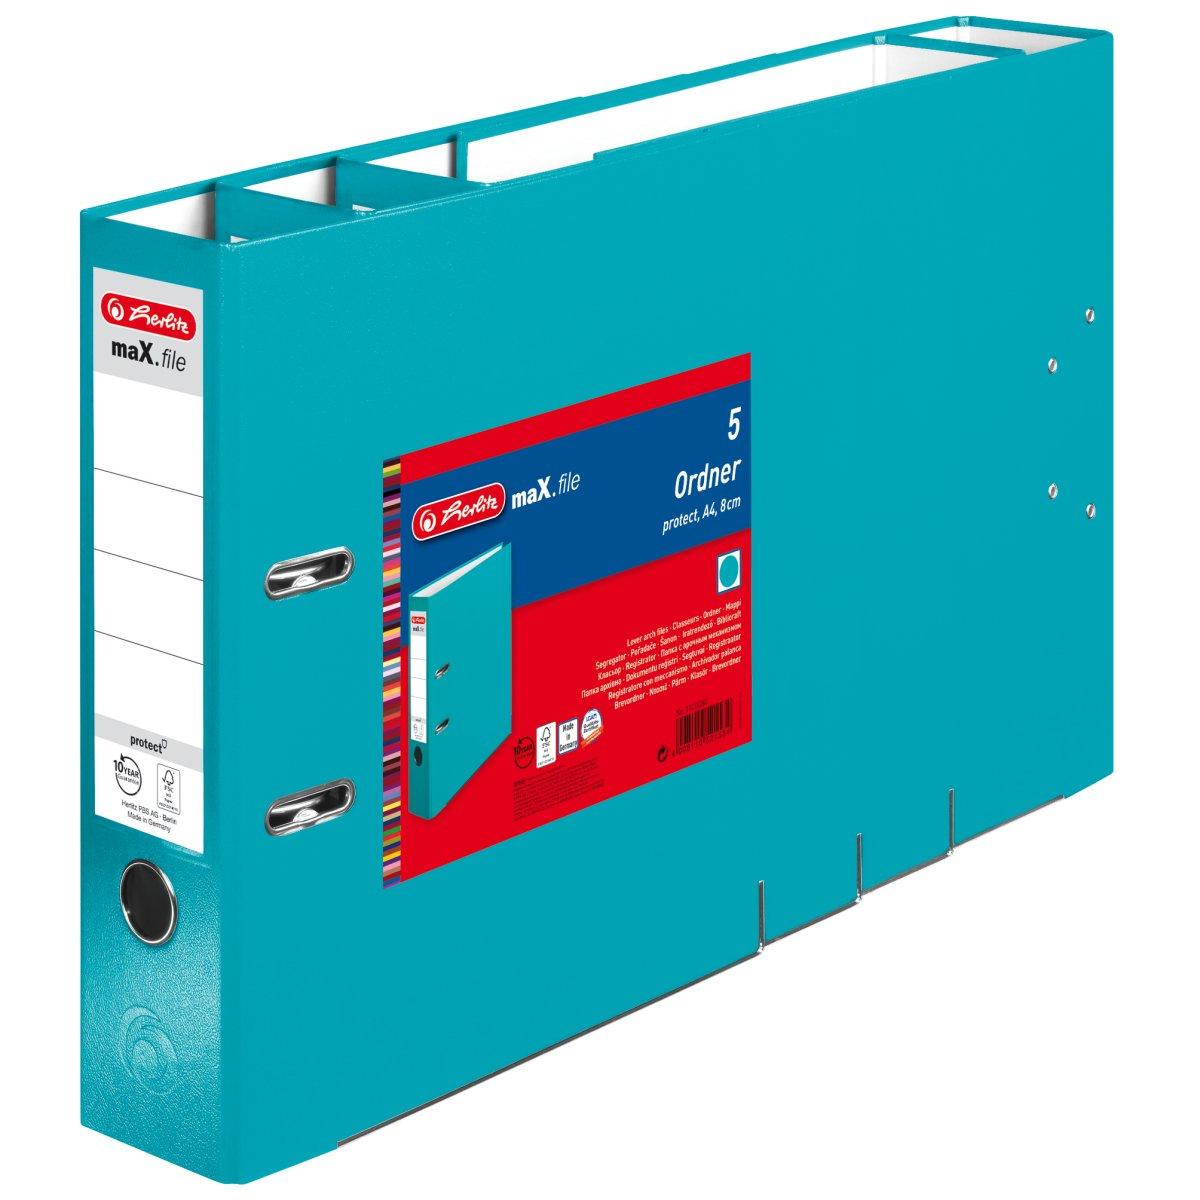 Vorschau: Herlitz 11416260 - 5 Blätter - Blau - Polypropylen (PP) - A4 - 80 mm